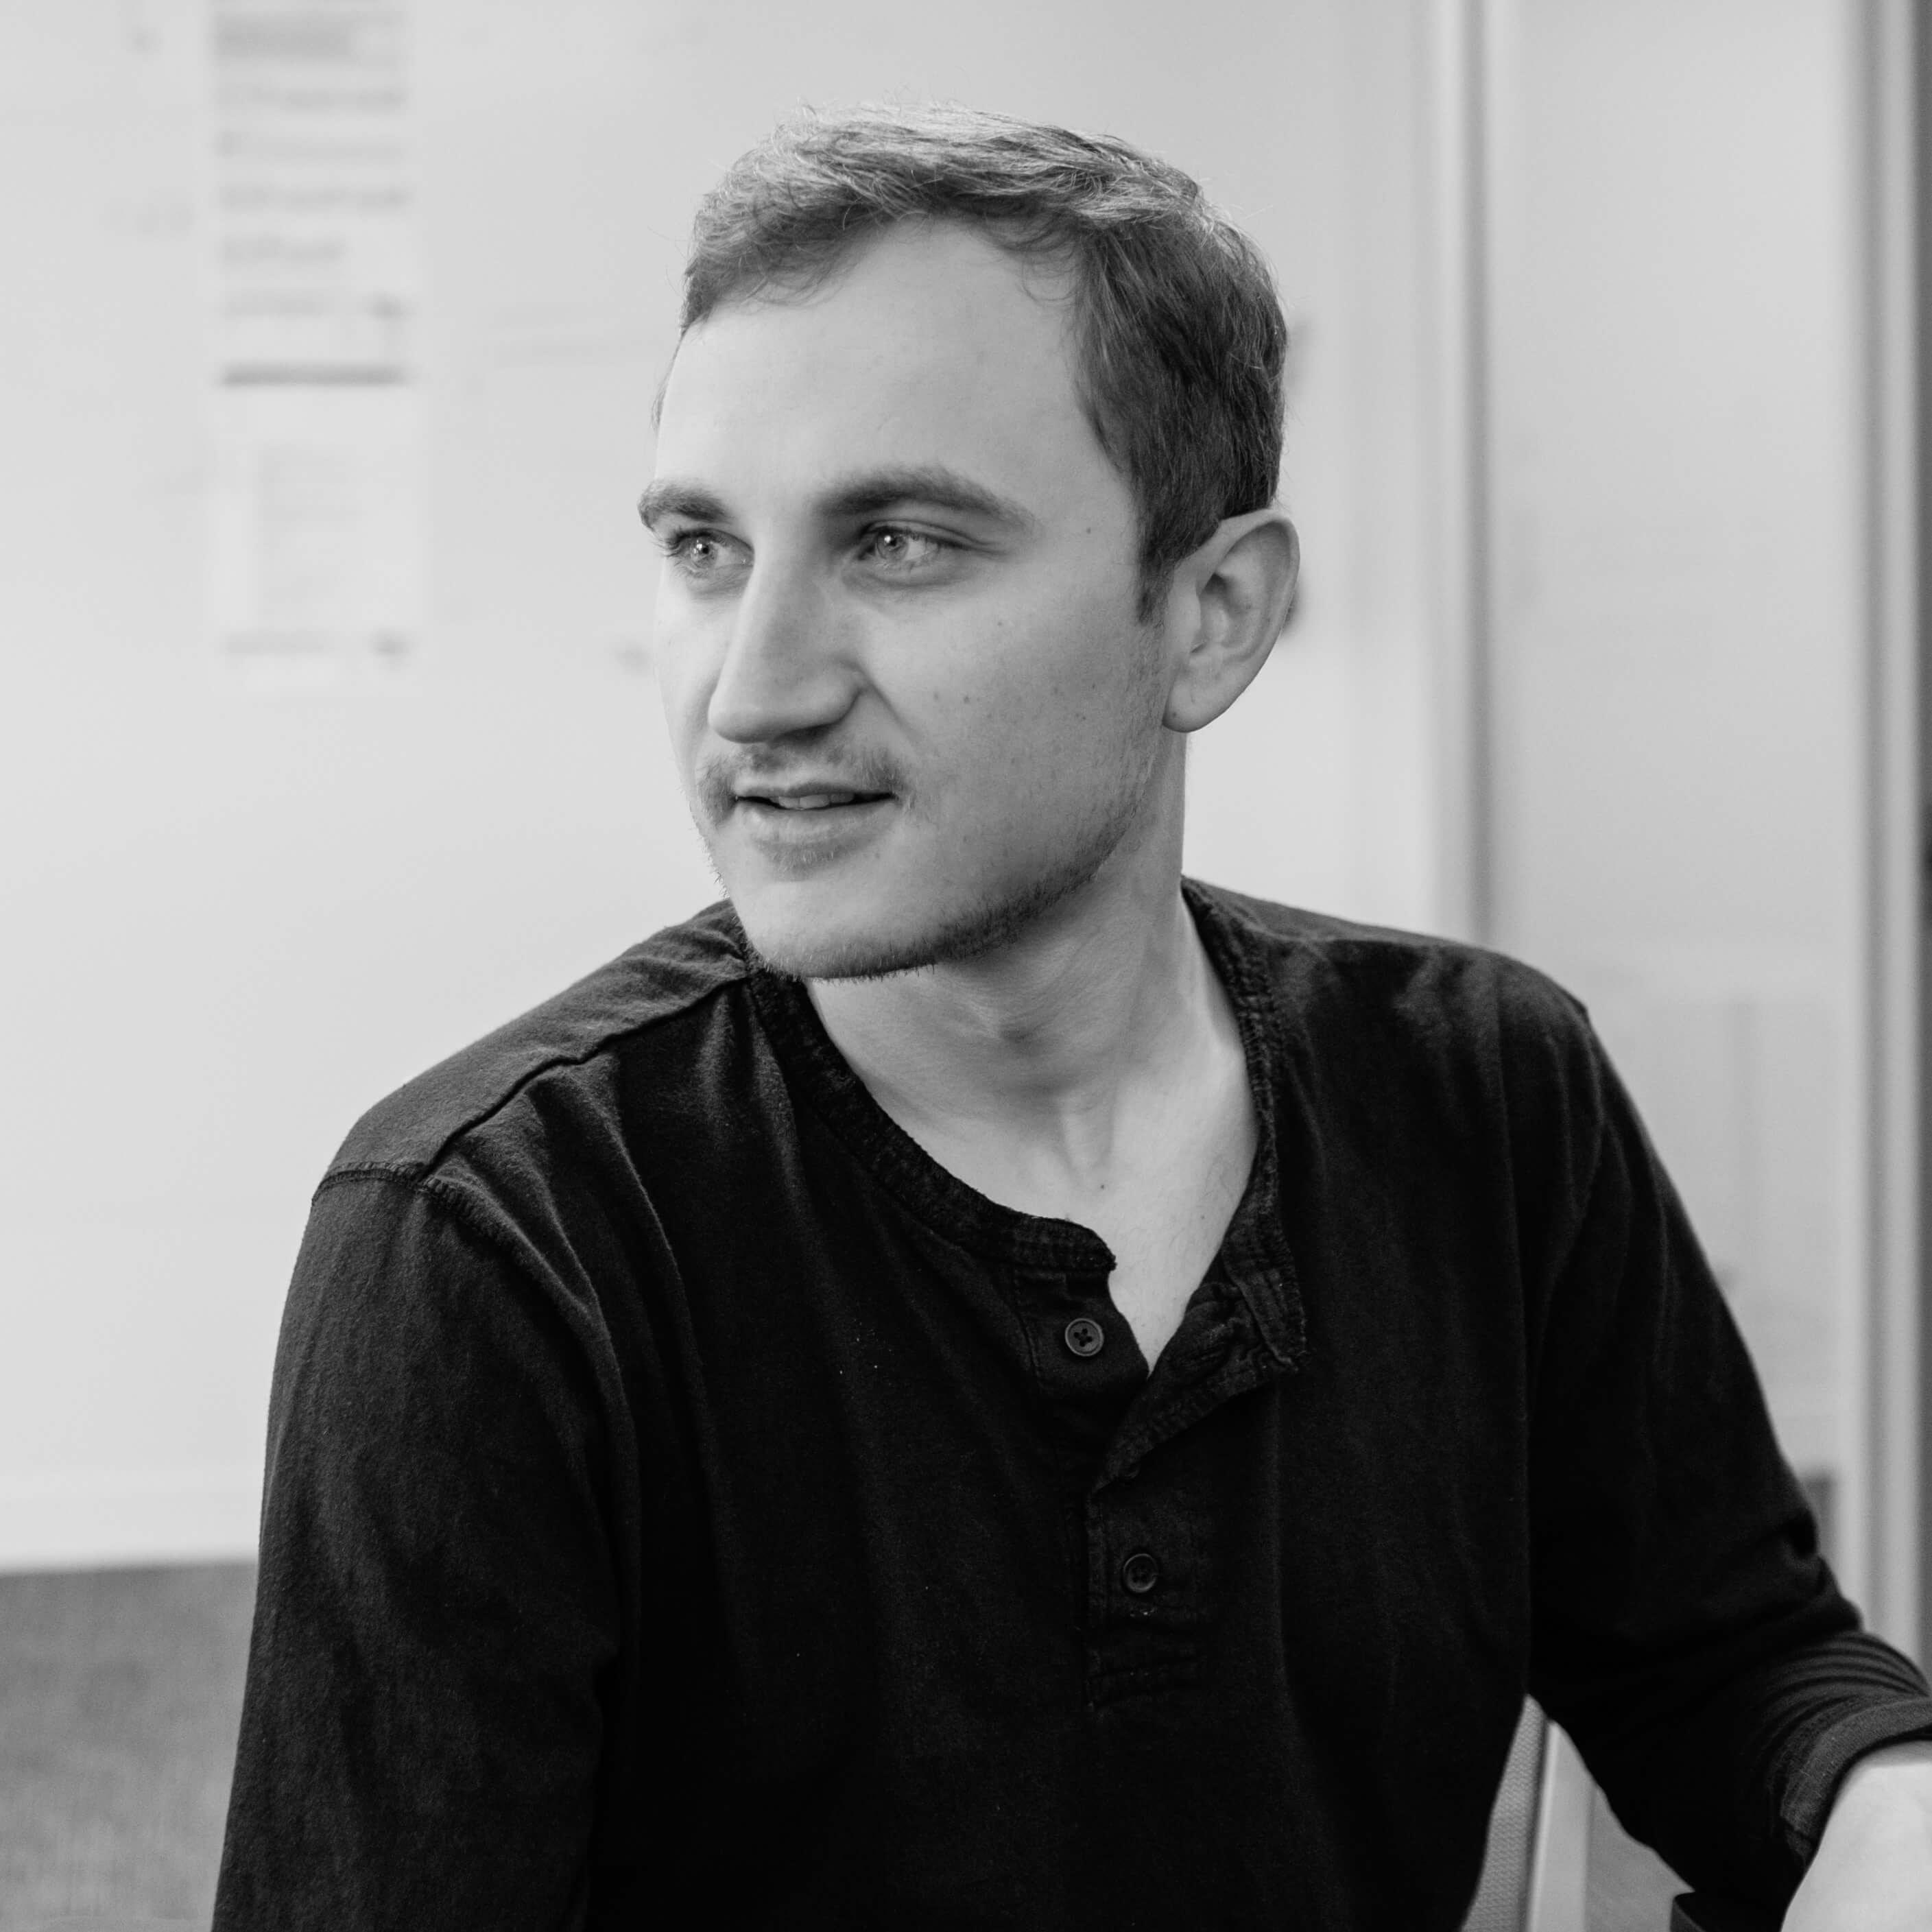 Go to Vlad Shapochnikov's profile